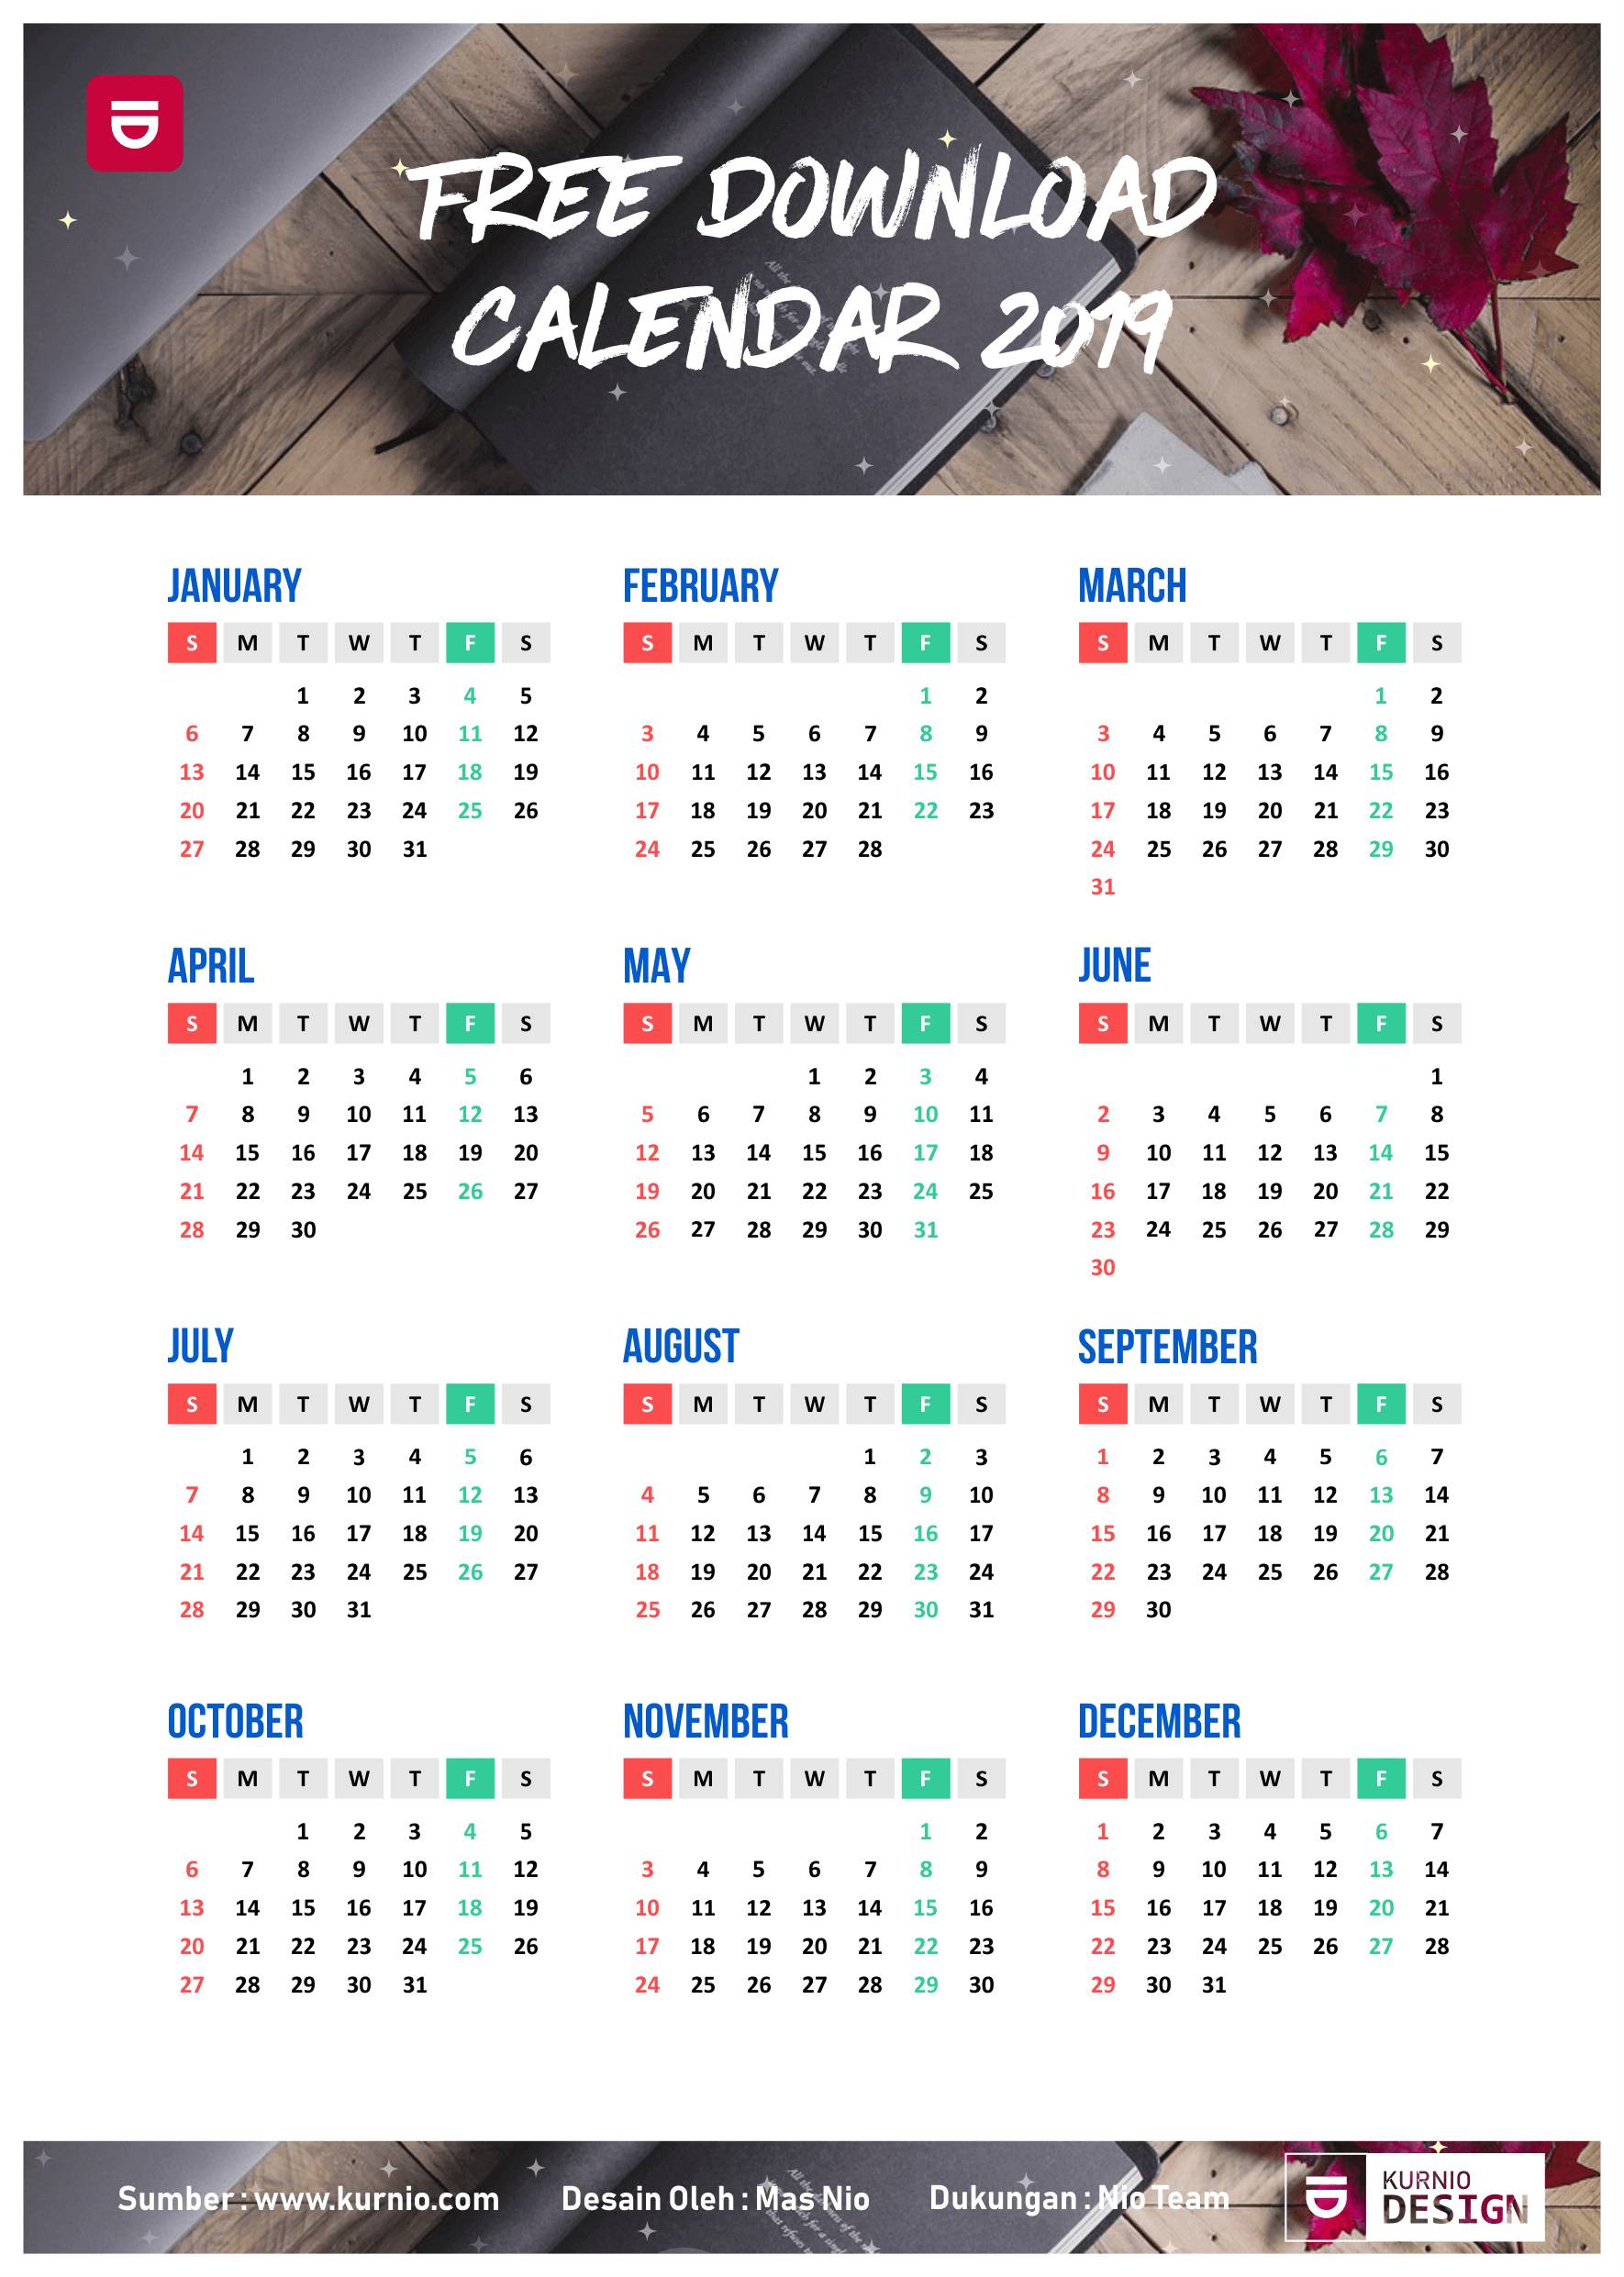 Download Template Calendar 2019 Vector Cdr Ai Psd Kalender Template Png